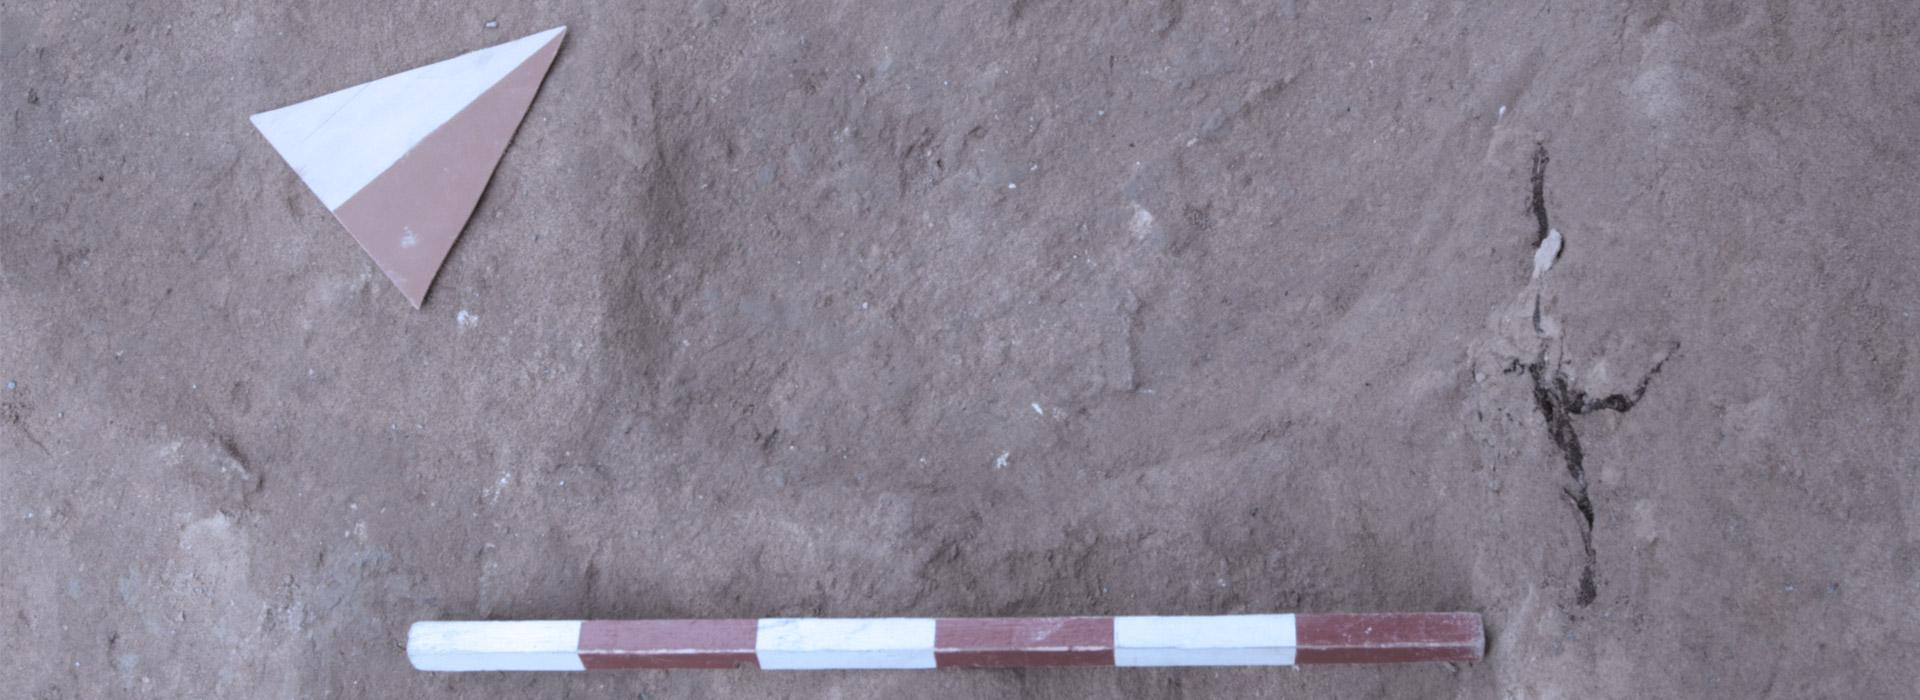 Società Cooperativa Archeologica ARA